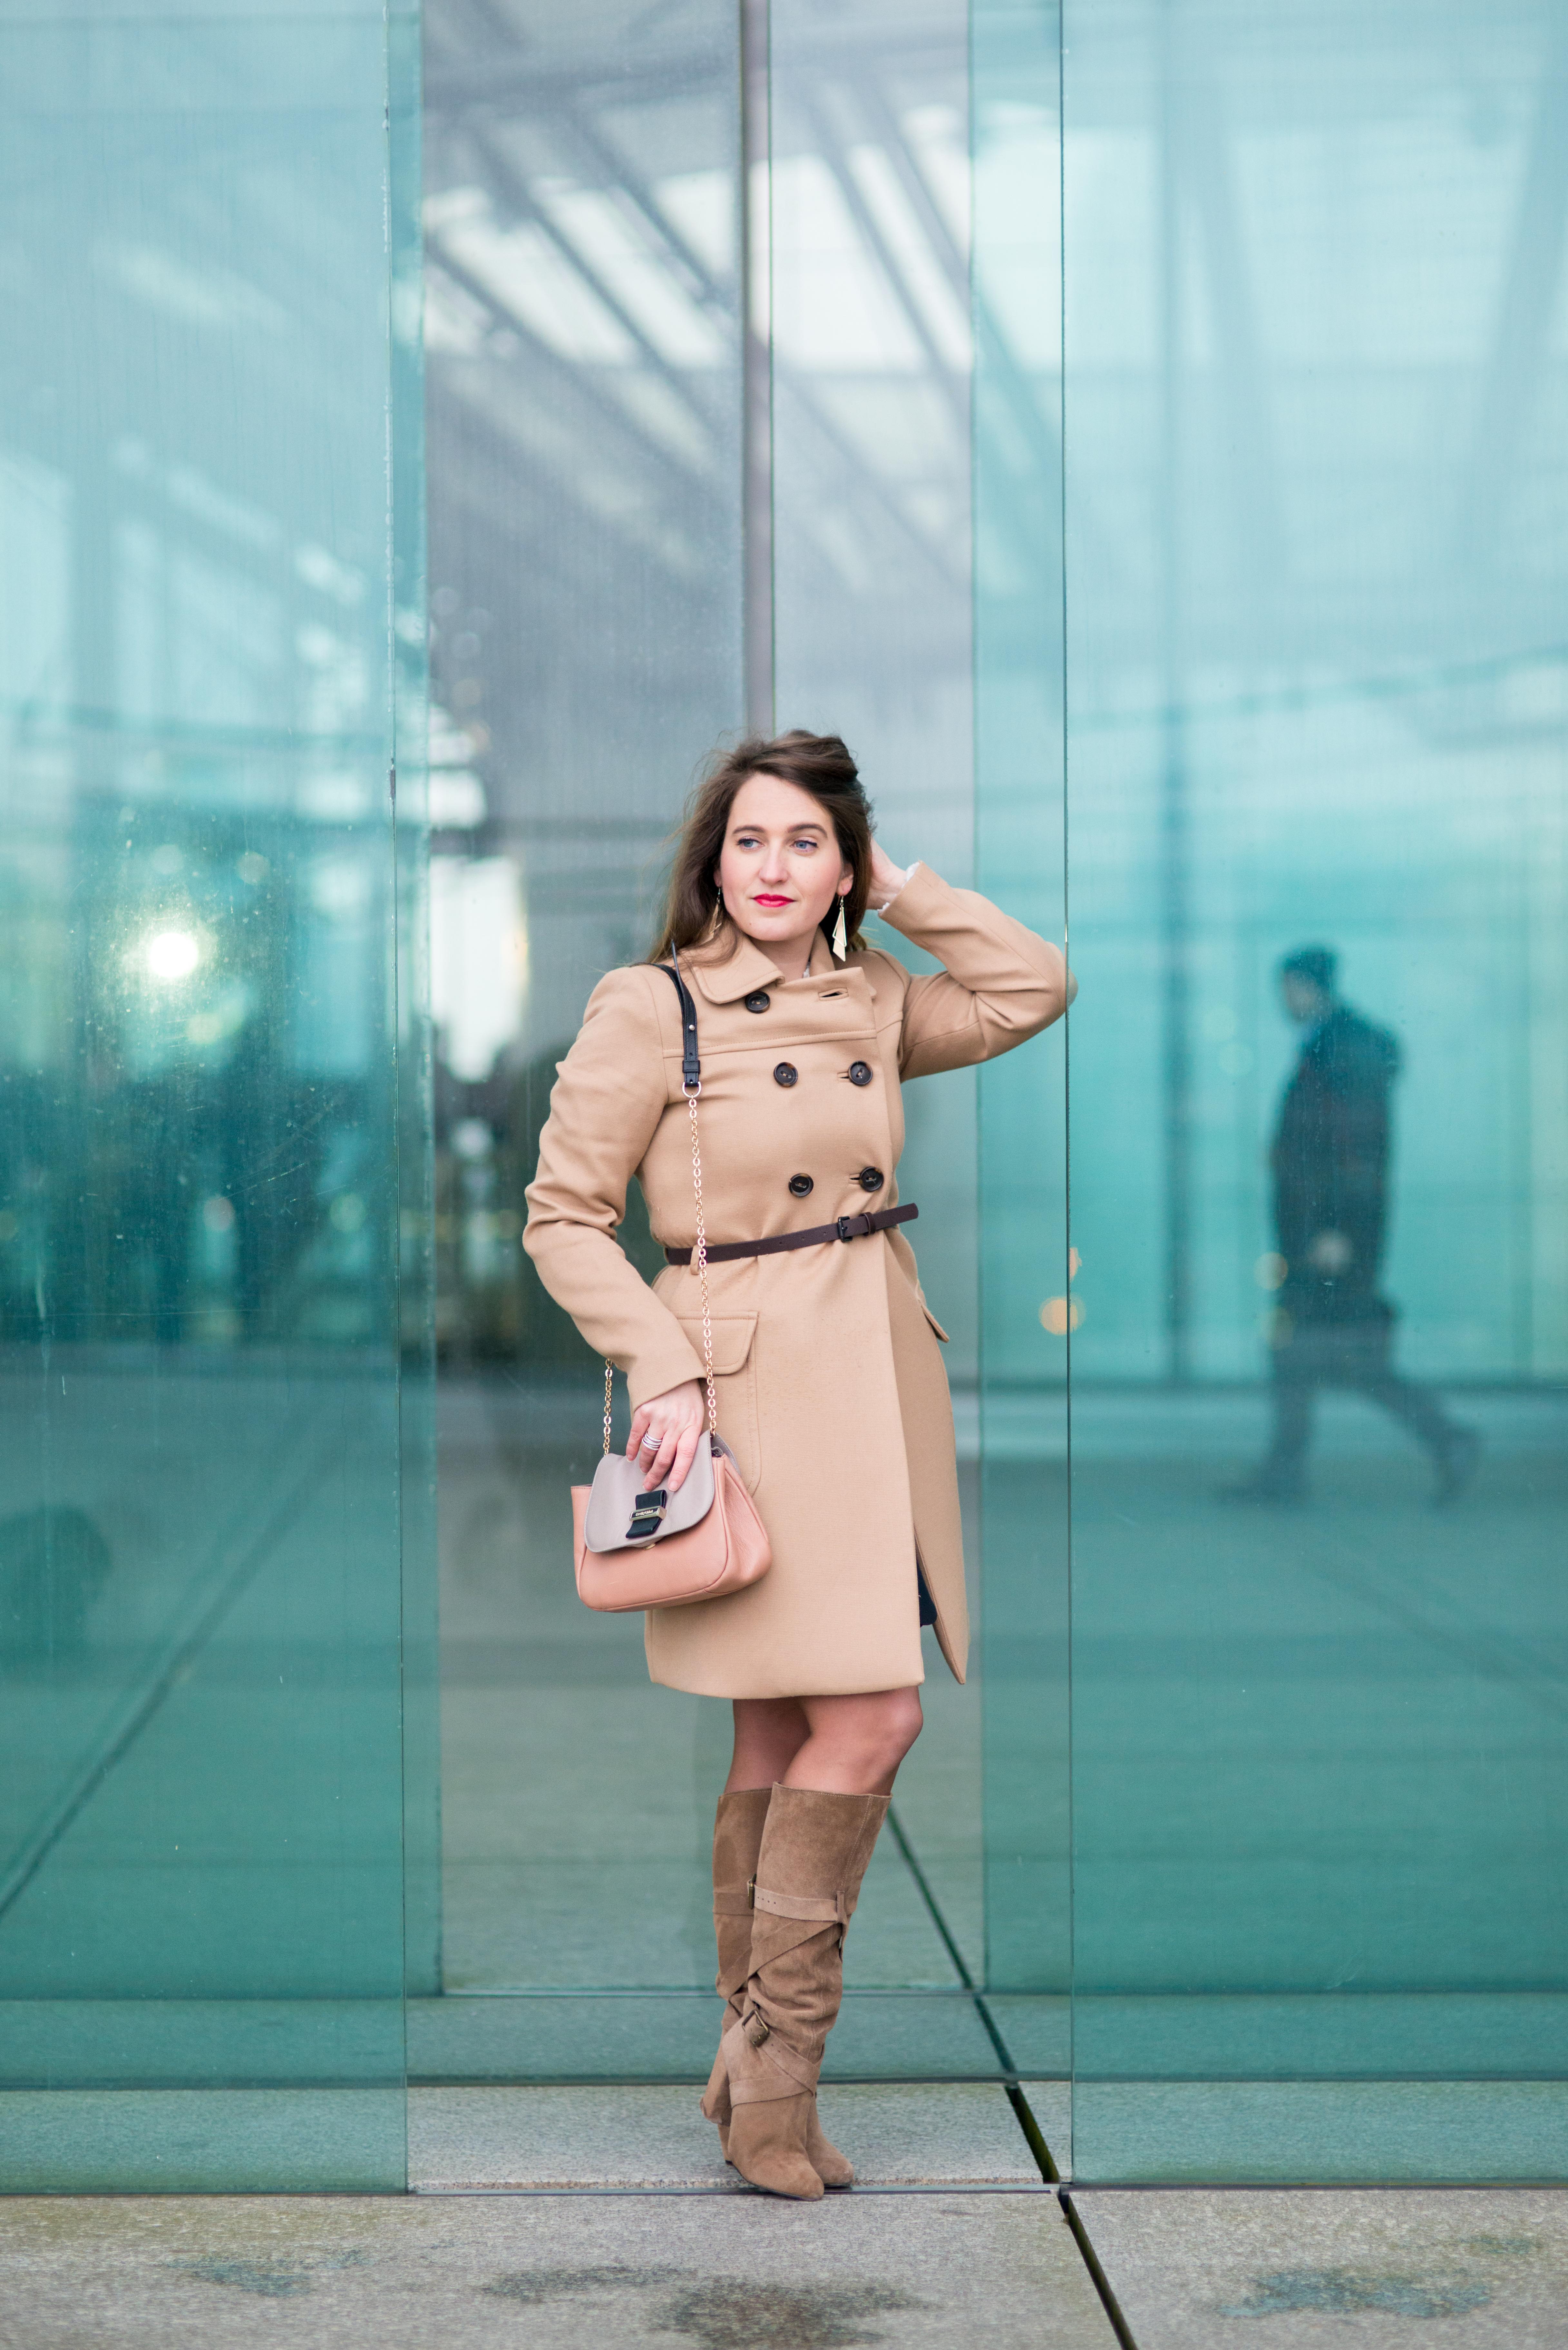 style-sophistique-modele-grandearche-ladefense-paris-fashionblogger-influencer-blouse-zara-seralynepointcom-ump_6665